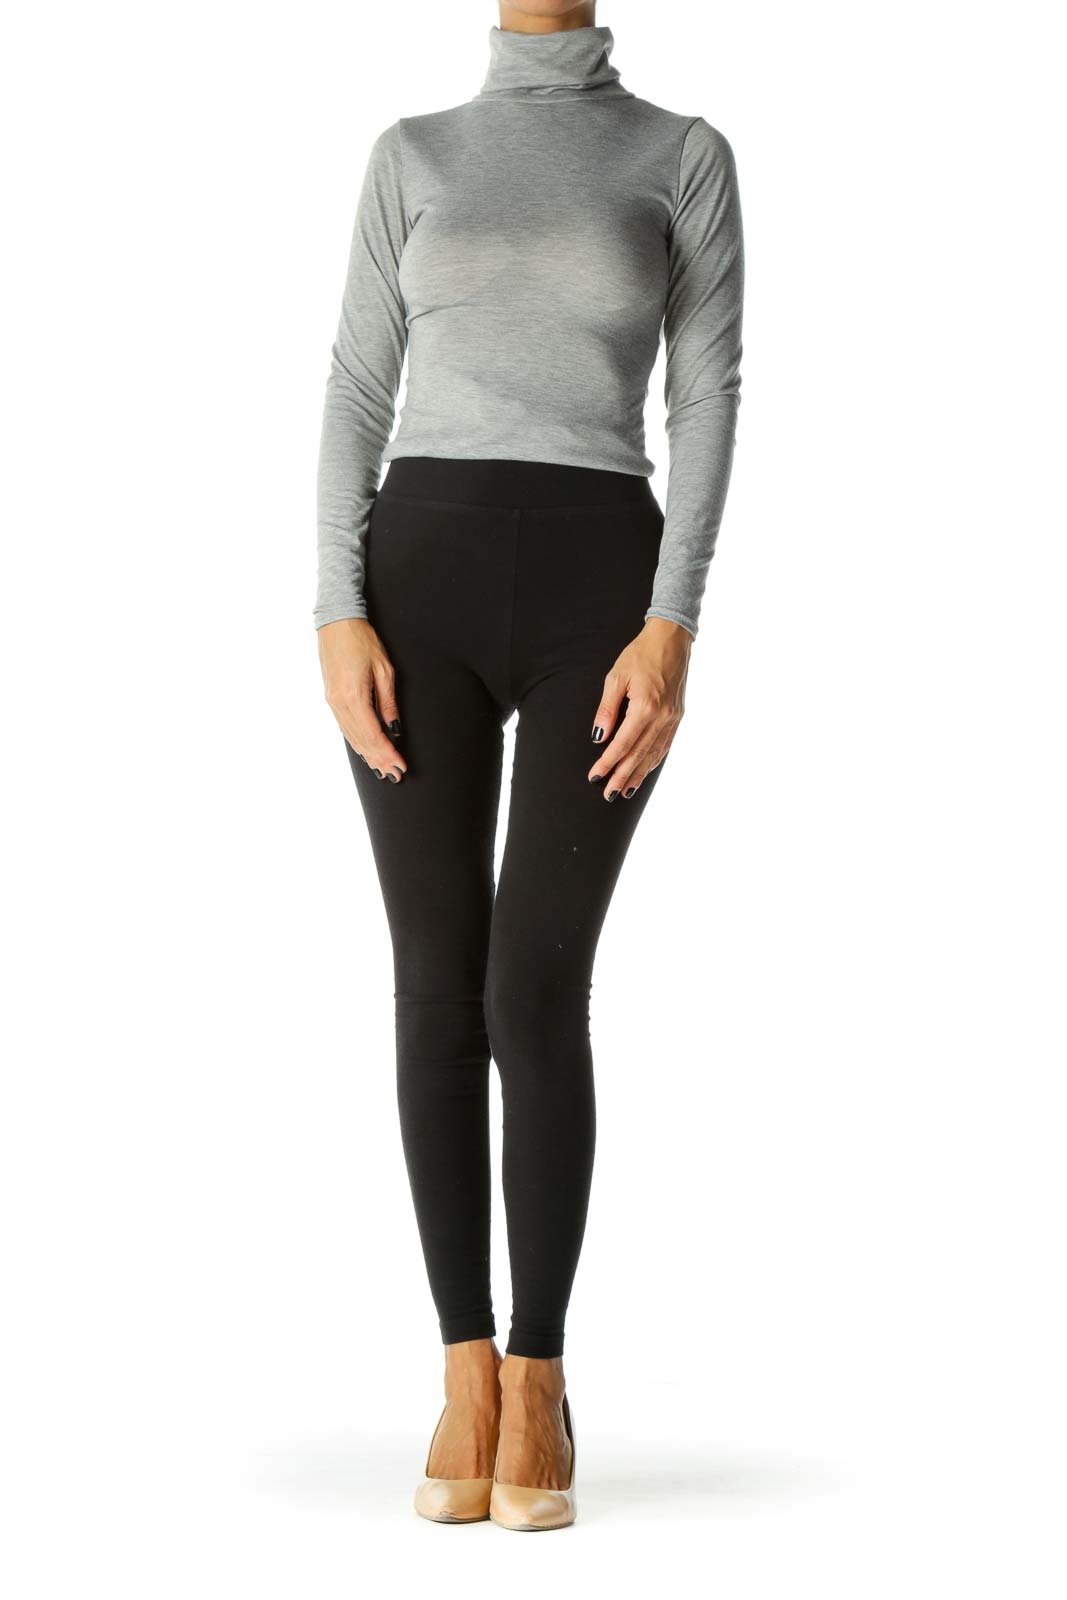 Gray Turtle-Neck Long-Sleeve Bodysuit